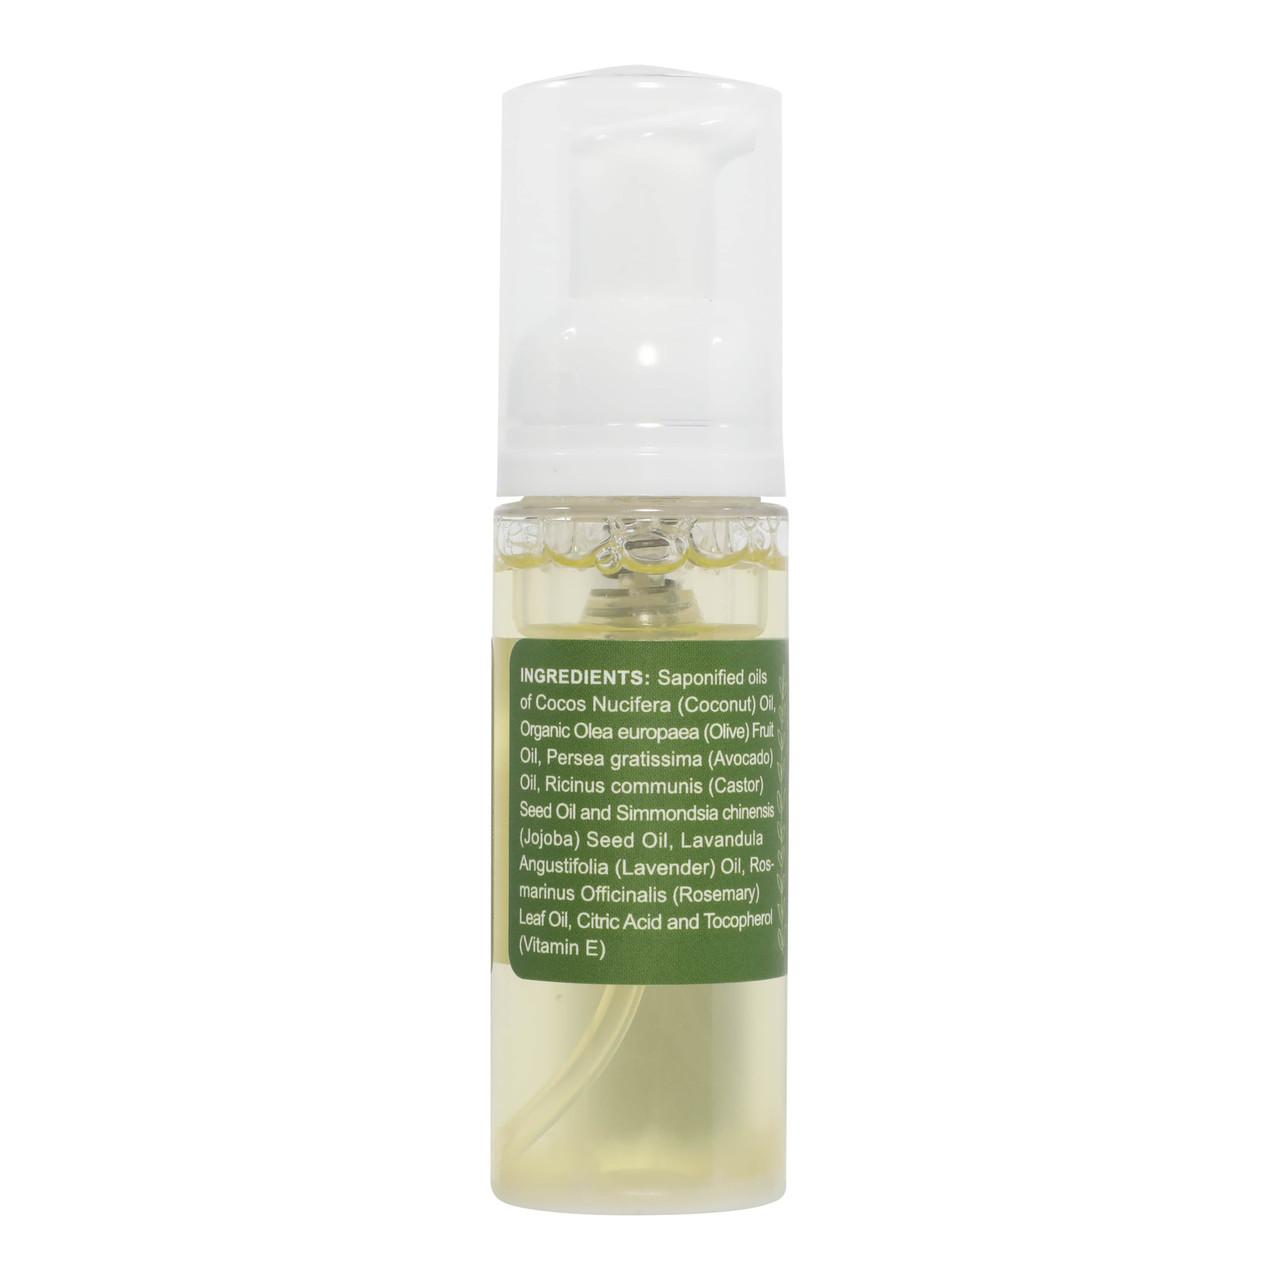 Clarity (Lavender + Rosemary) Travel Size Liquid Soap | Mama Bath + Body